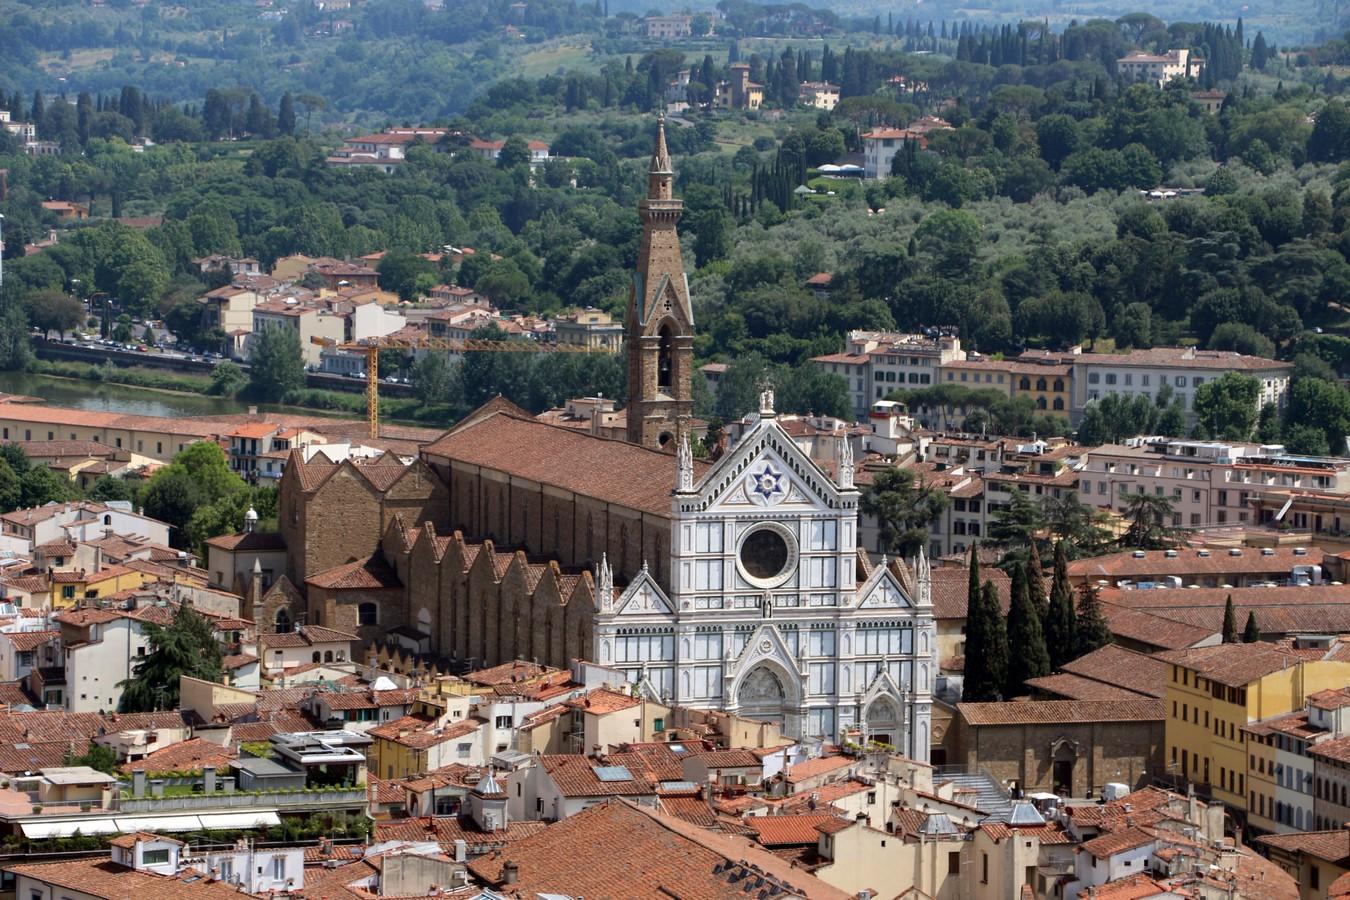 Basilica of Santa Croce - Sheet1